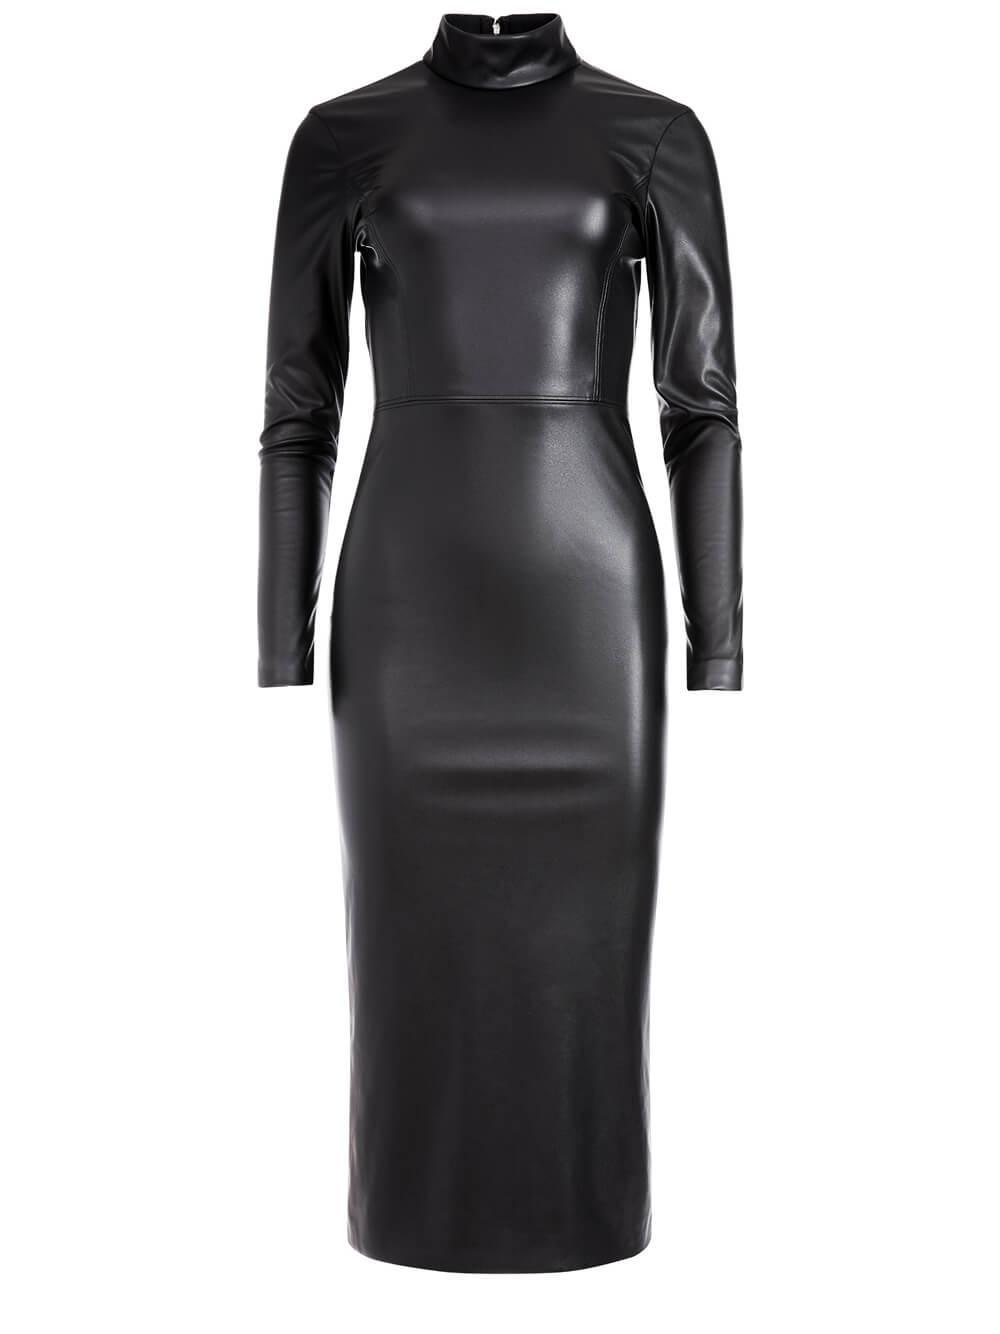 Delora Vegan Leather Dress Item # CC009J22537